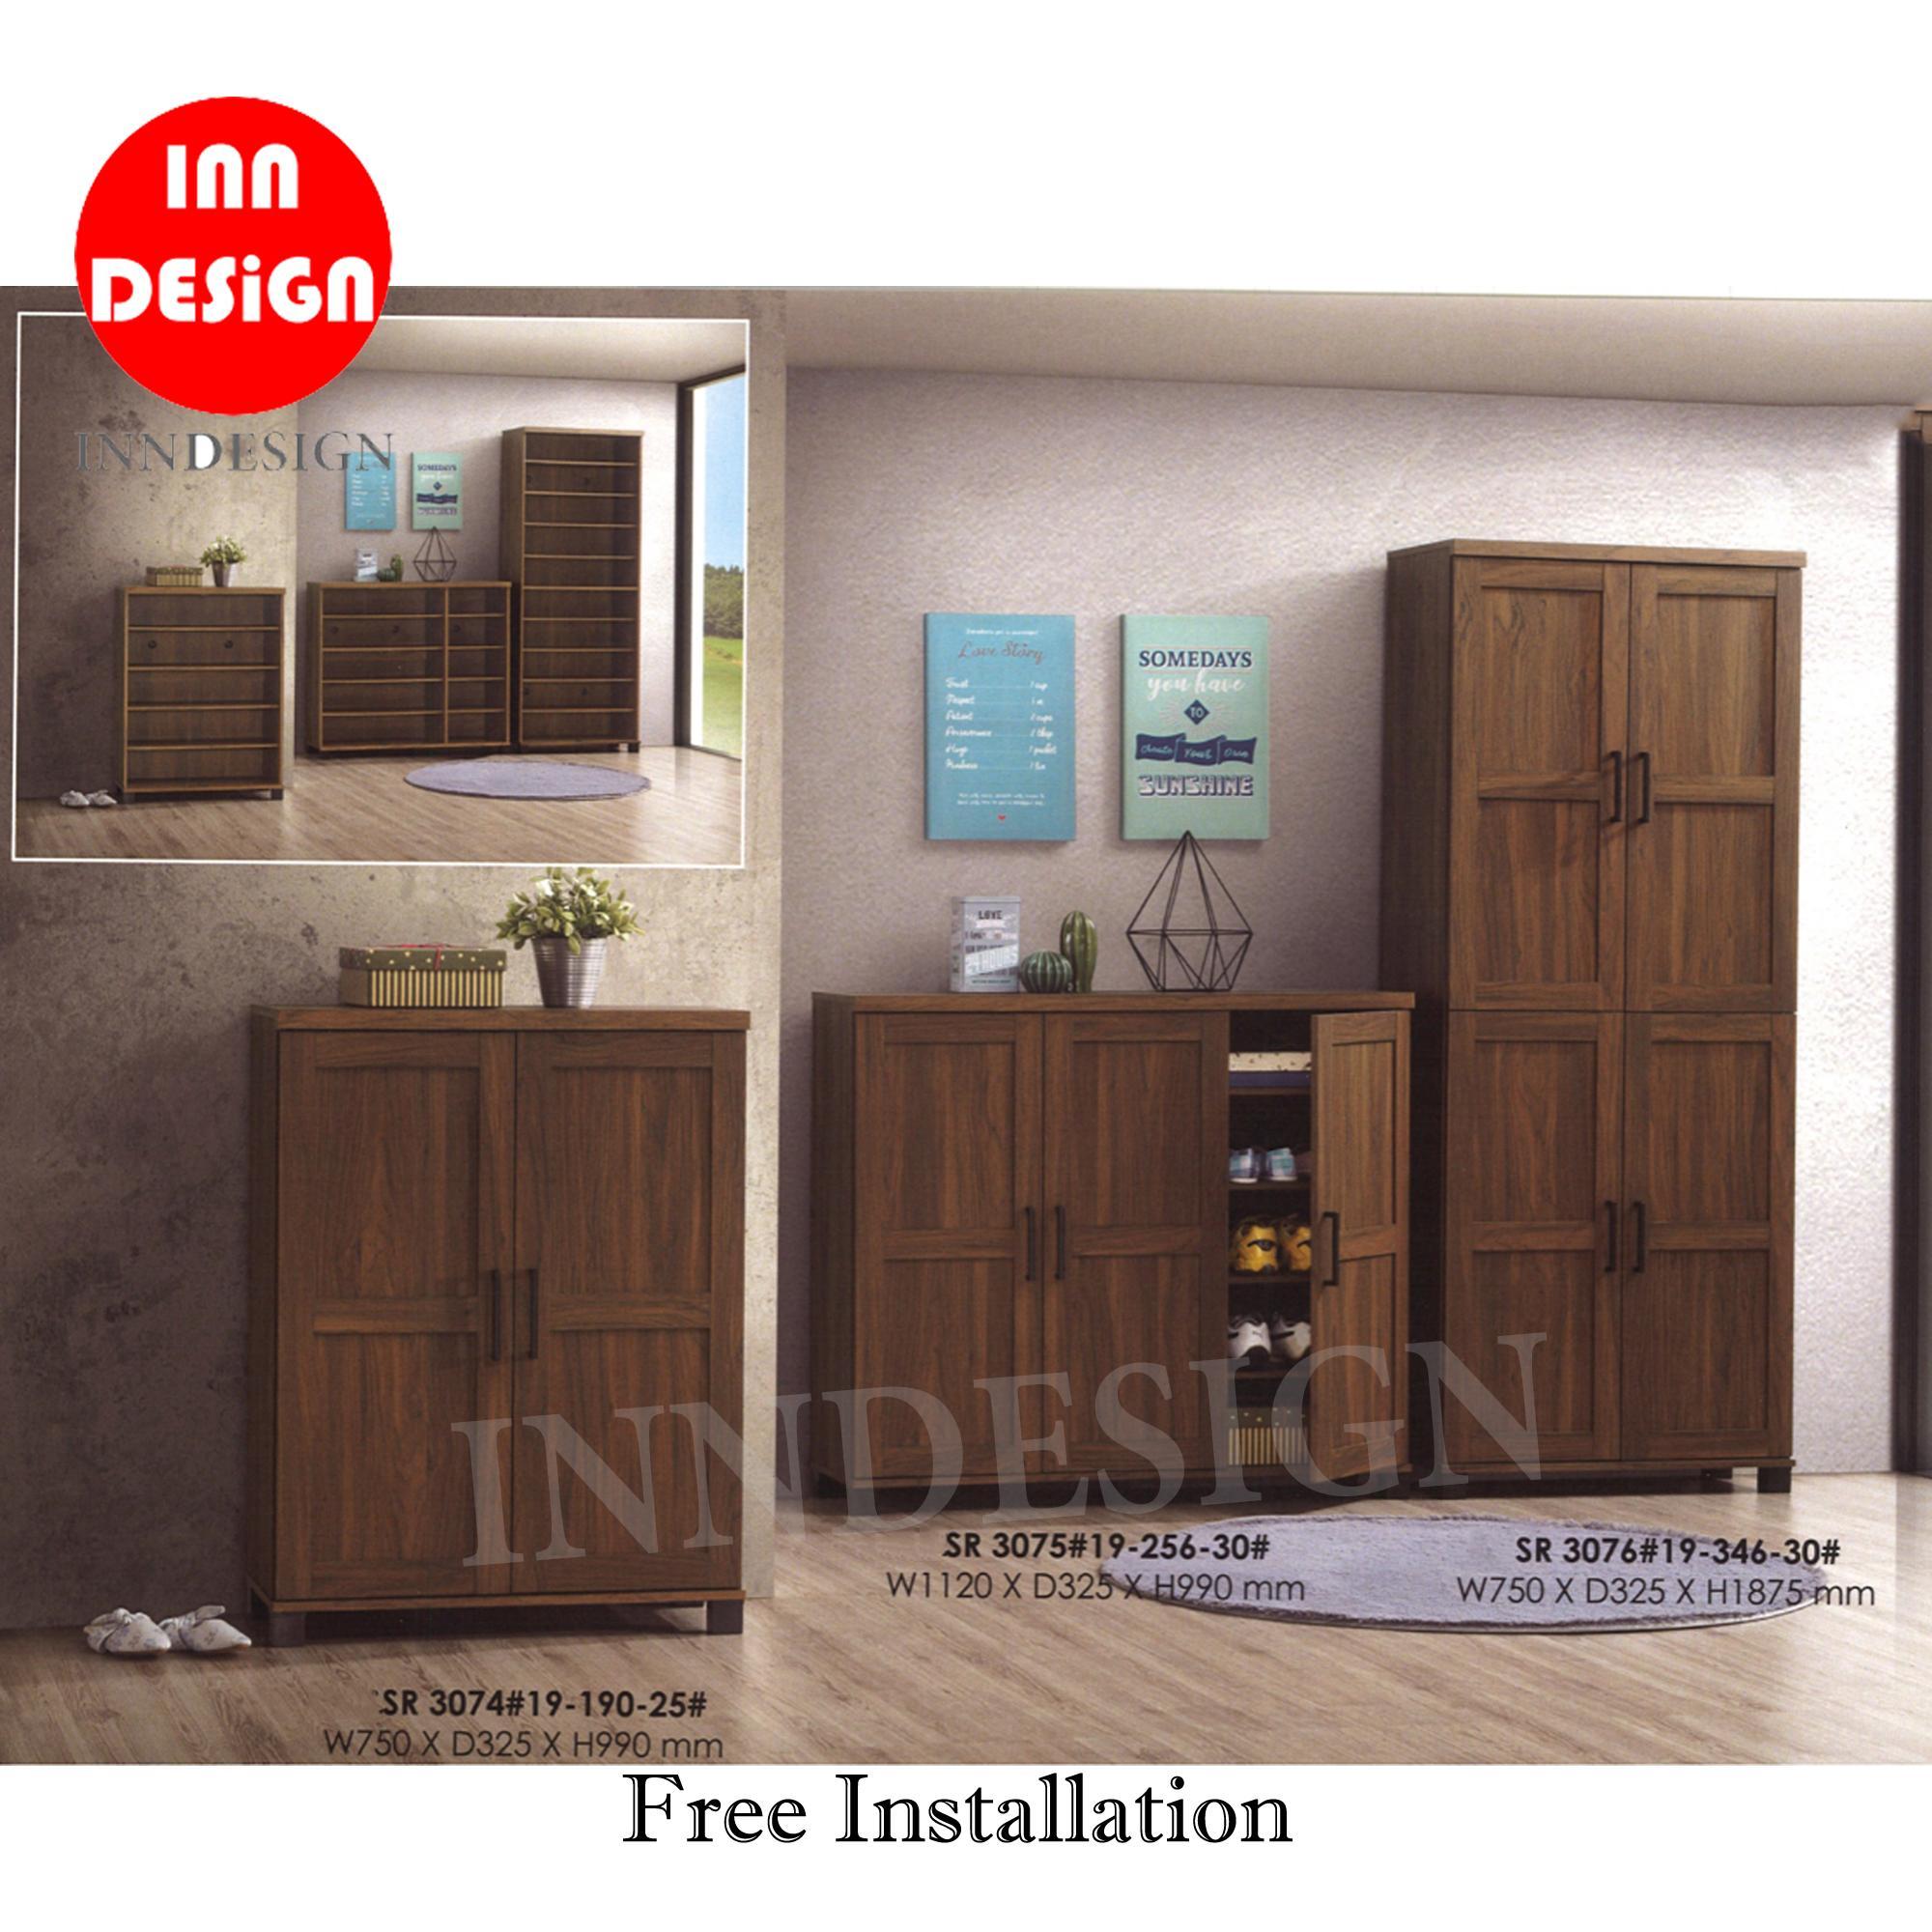 Miko 2/3/4 Doors Shoe Cabinet (Free Installation) (2019 New Design)